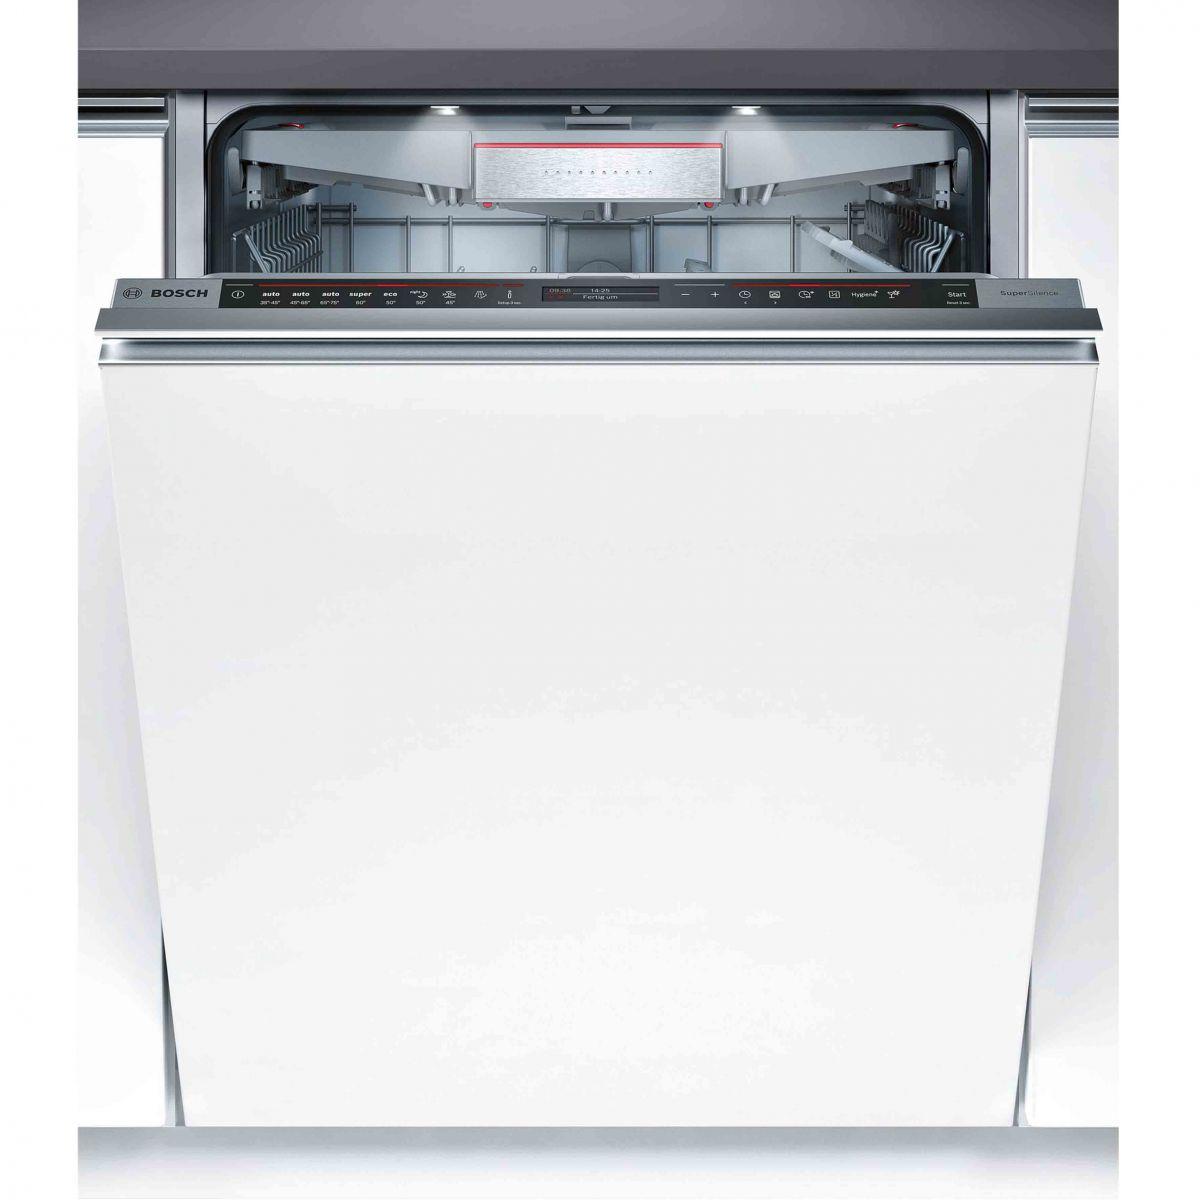 Top các máy rửa bát Bosch tốt nhất 2020